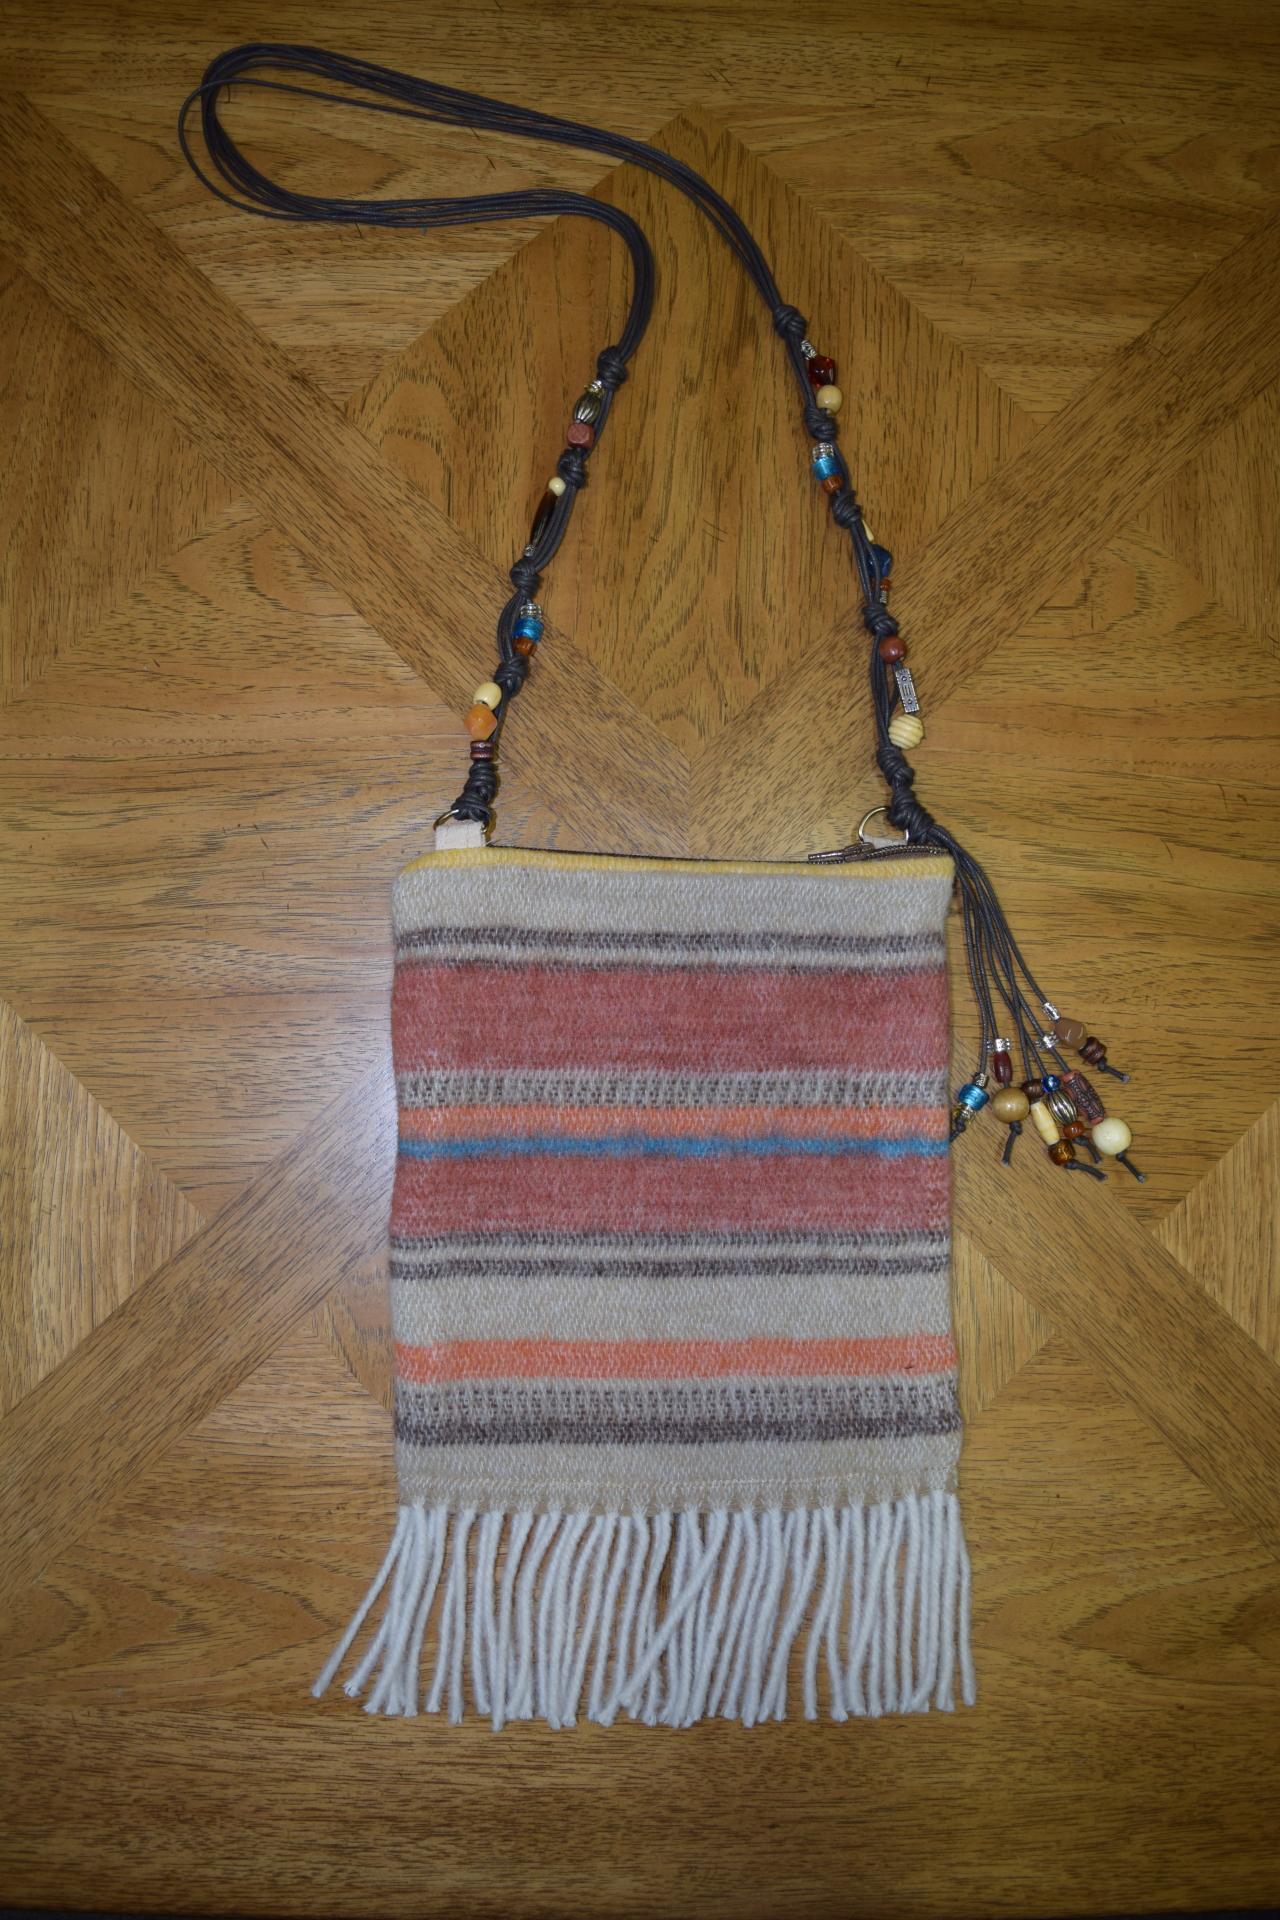 #B05 ARAPAHOE FRINGE BEADED STRAP ZIP BAG - $129.95